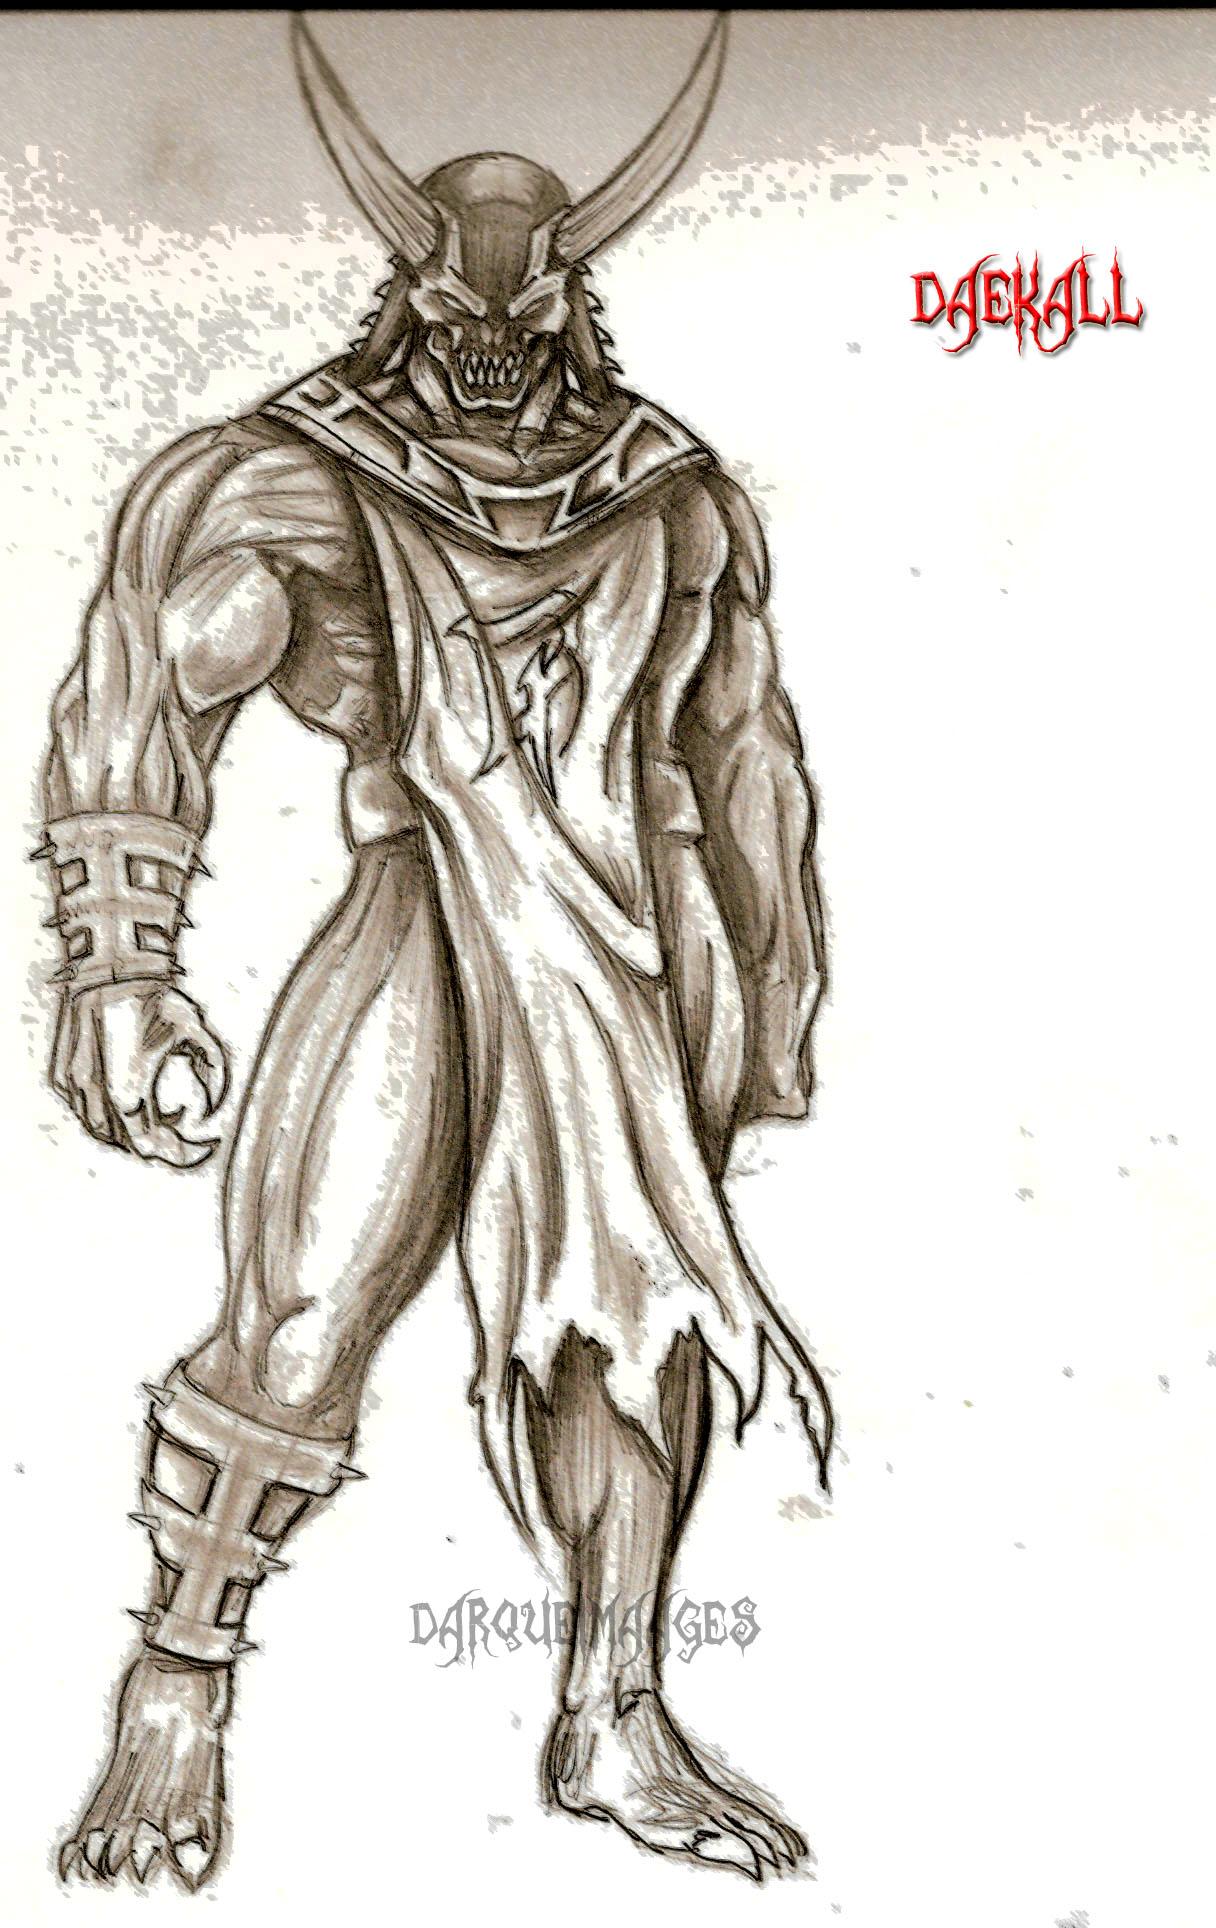 Character Concept: Daekall